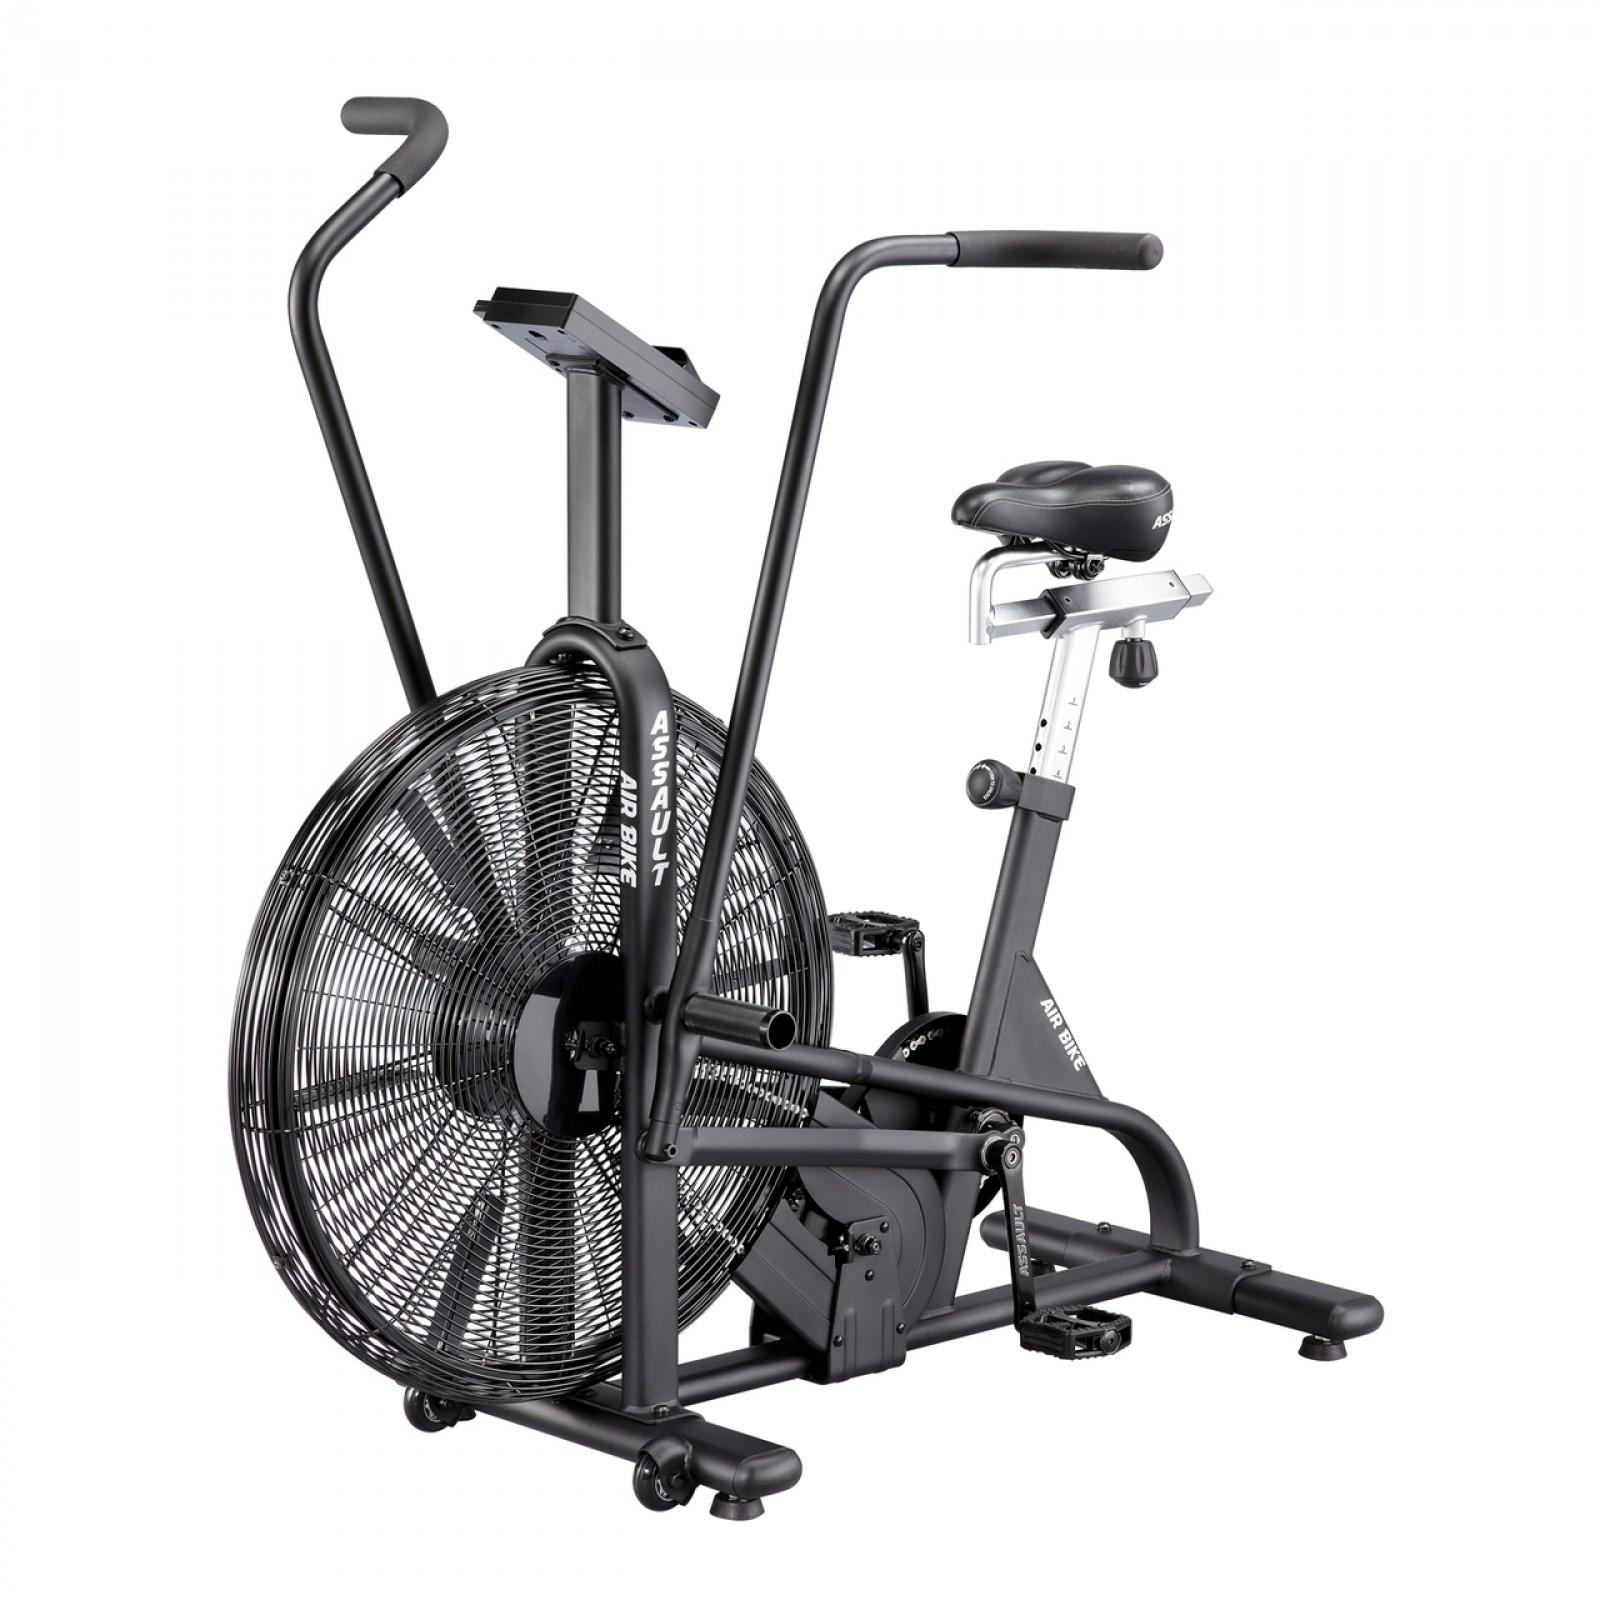 assault exercise bike airbike buy with 14 customer ratings sportAirbike #12